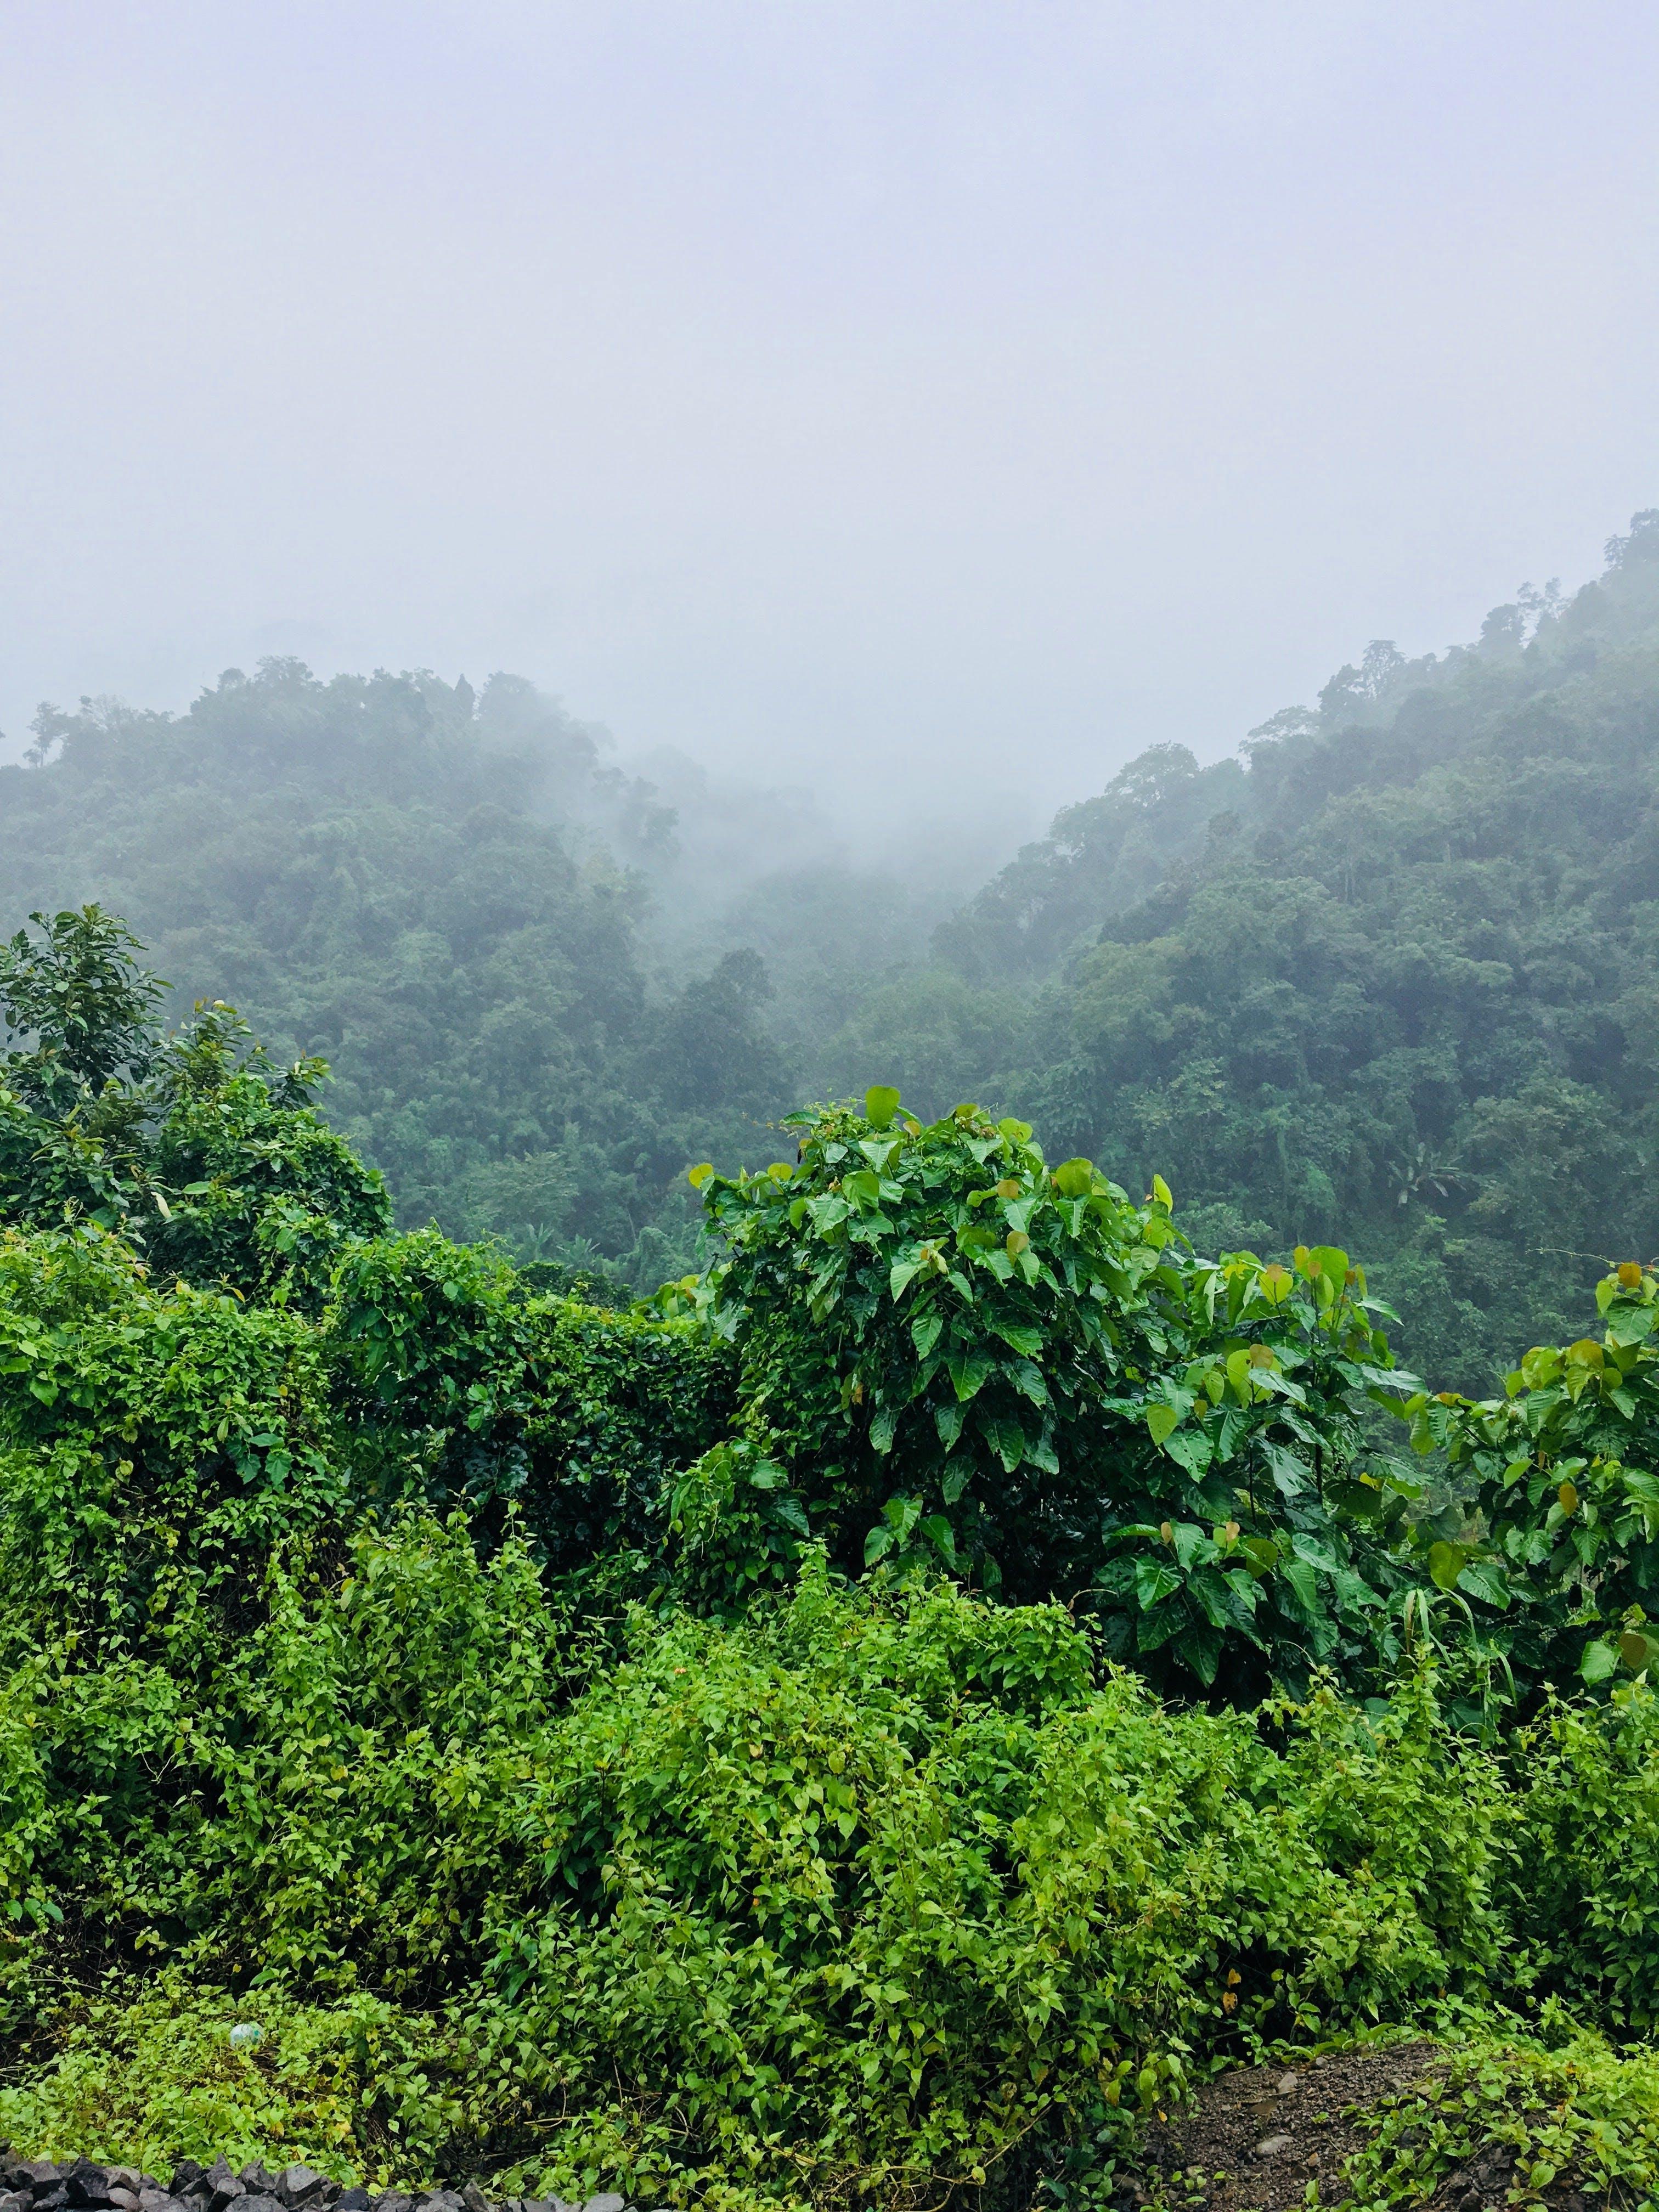 Green Leafed Plants Under Foggy Morning